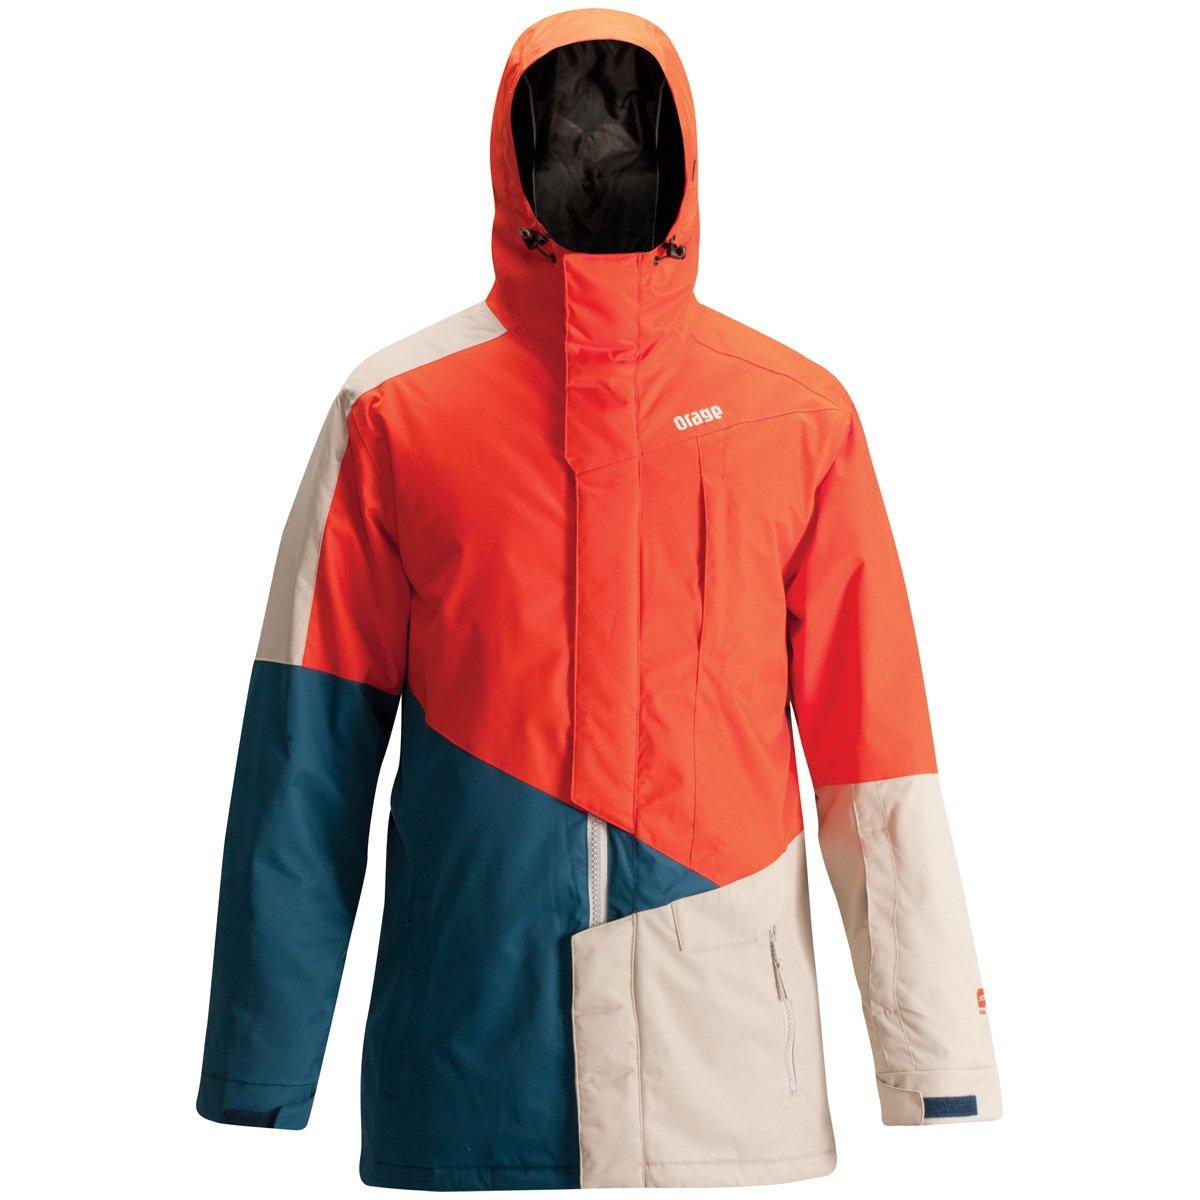 fake parajumpers jacket men free shipping on 64. Black Bedroom Furniture Sets. Home Design Ideas